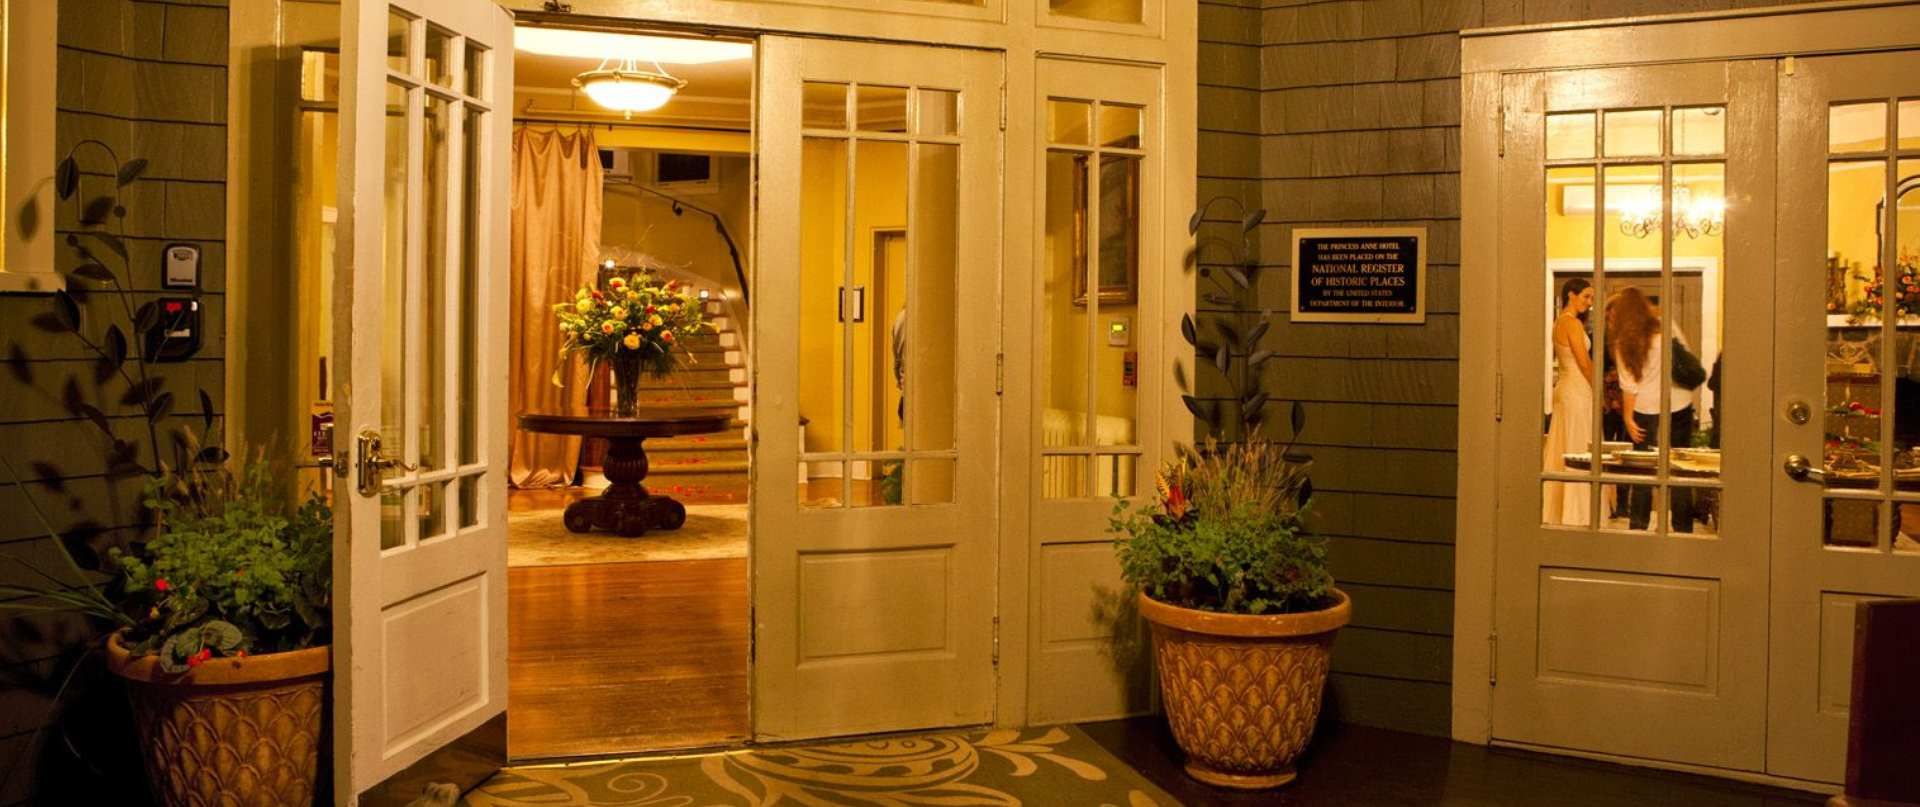 princess anne hotel asheville nc guest house historic. Black Bedroom Furniture Sets. Home Design Ideas